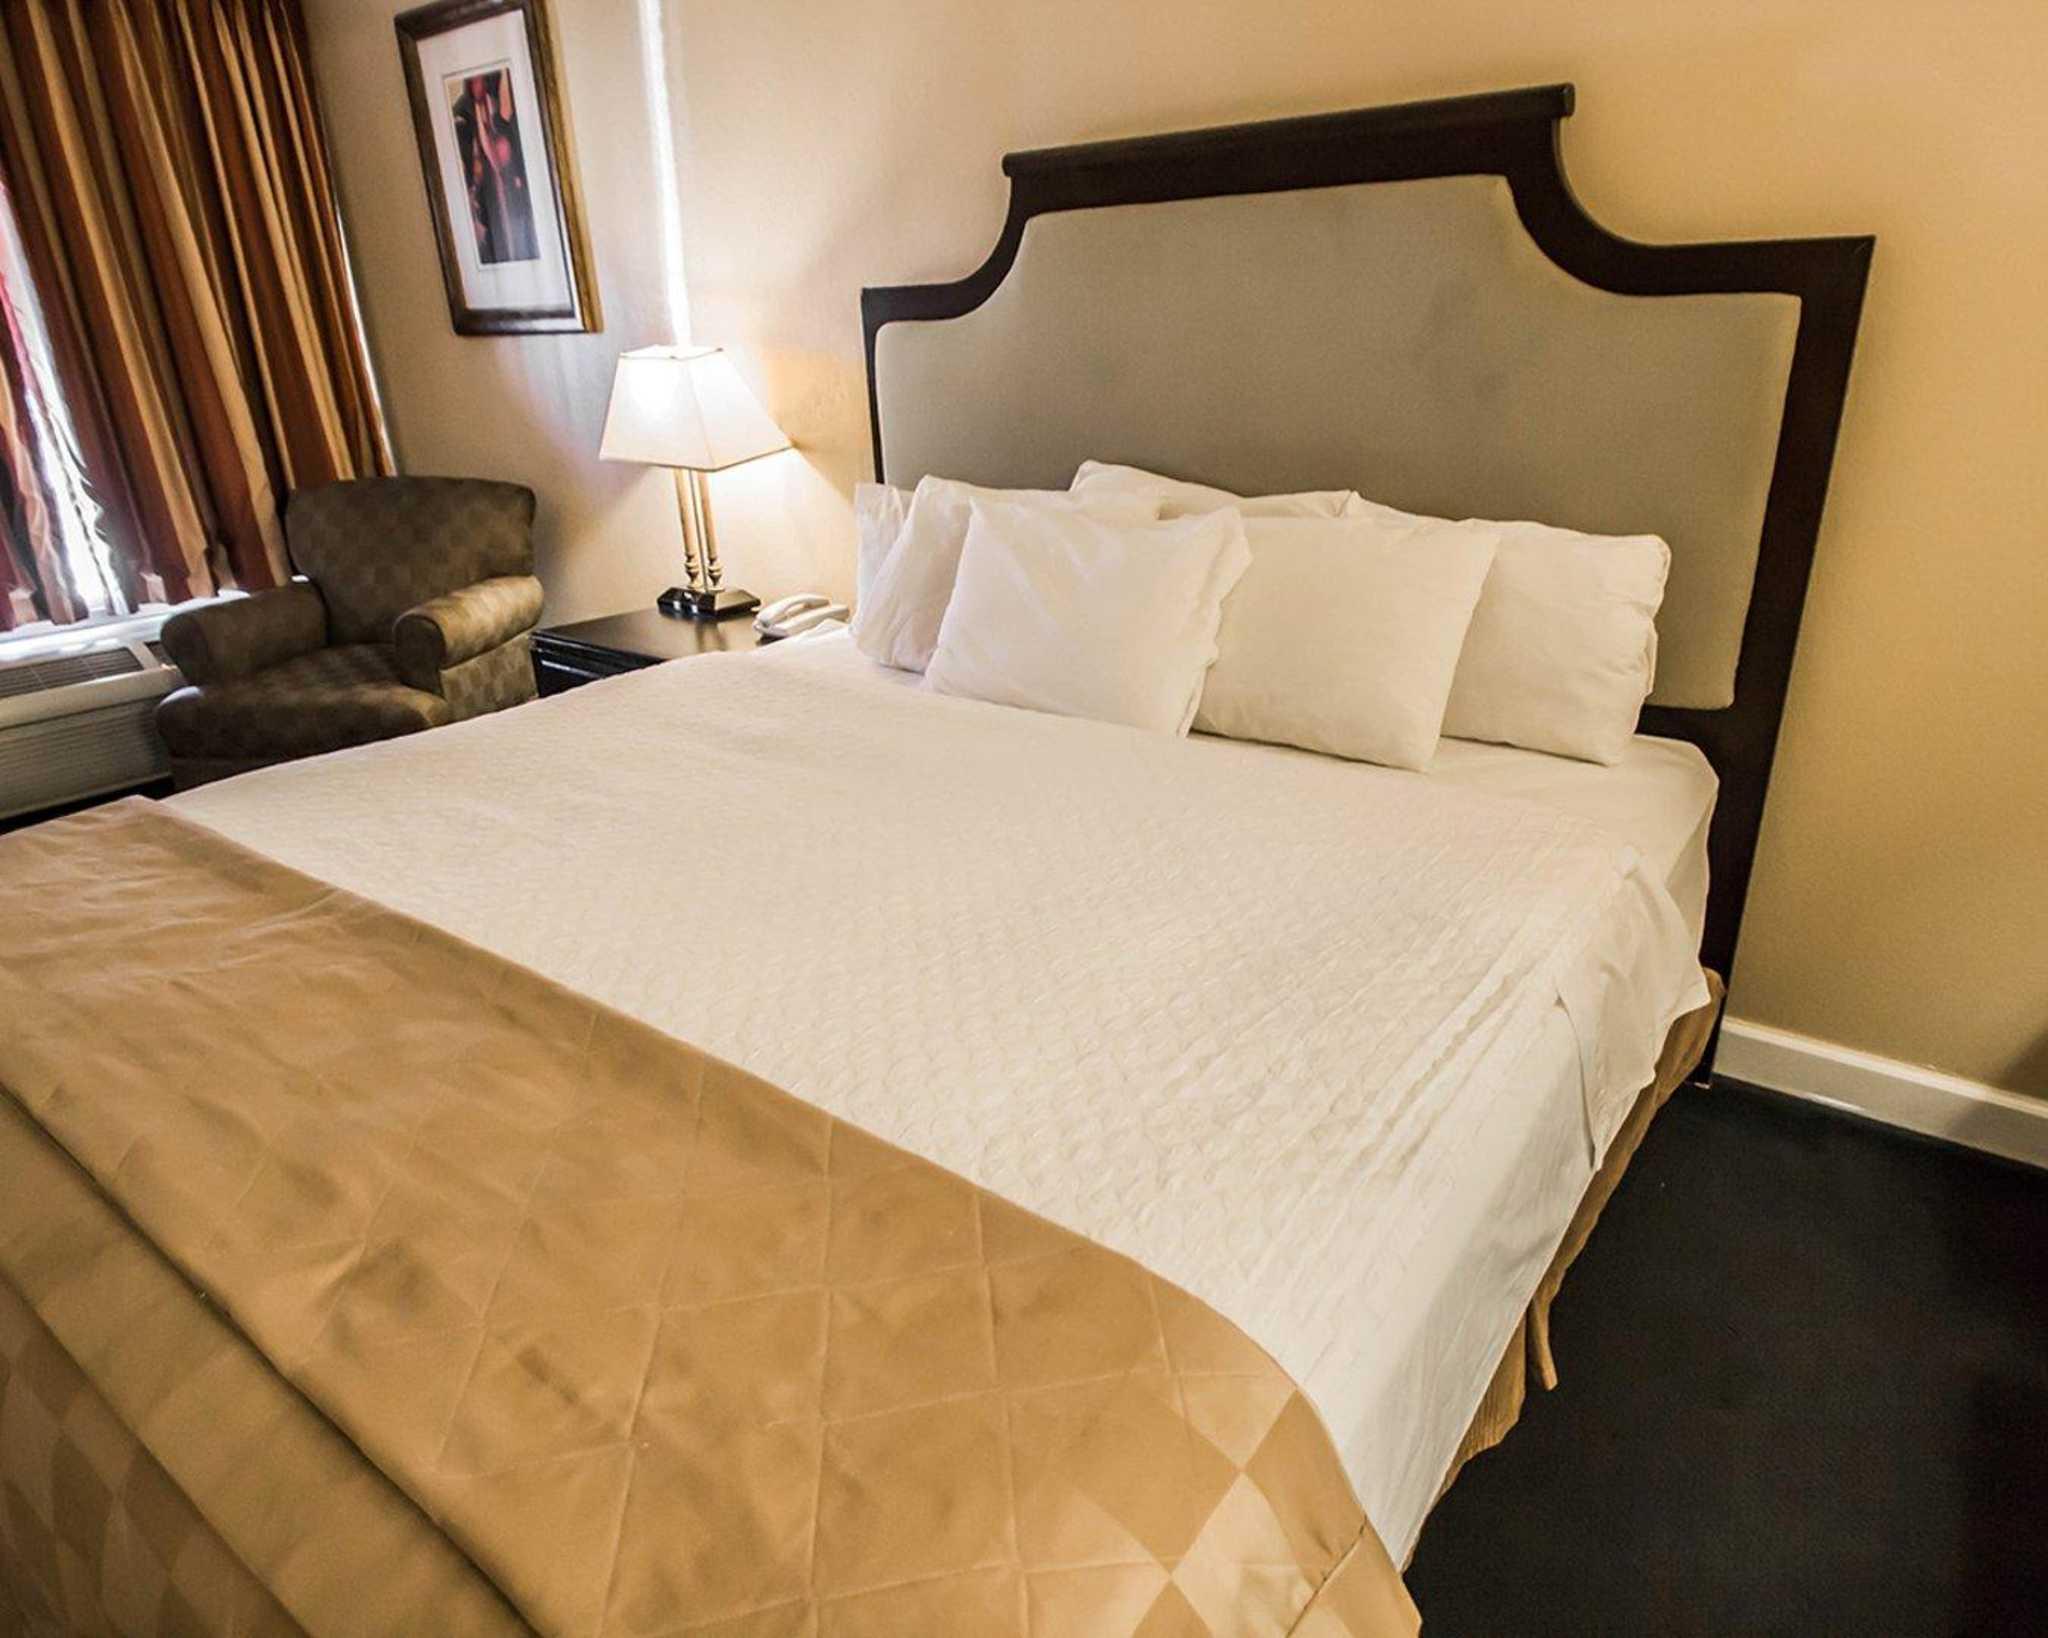 Hotels in 32830 Orlando Florida, Hotel near (32830) ZIP